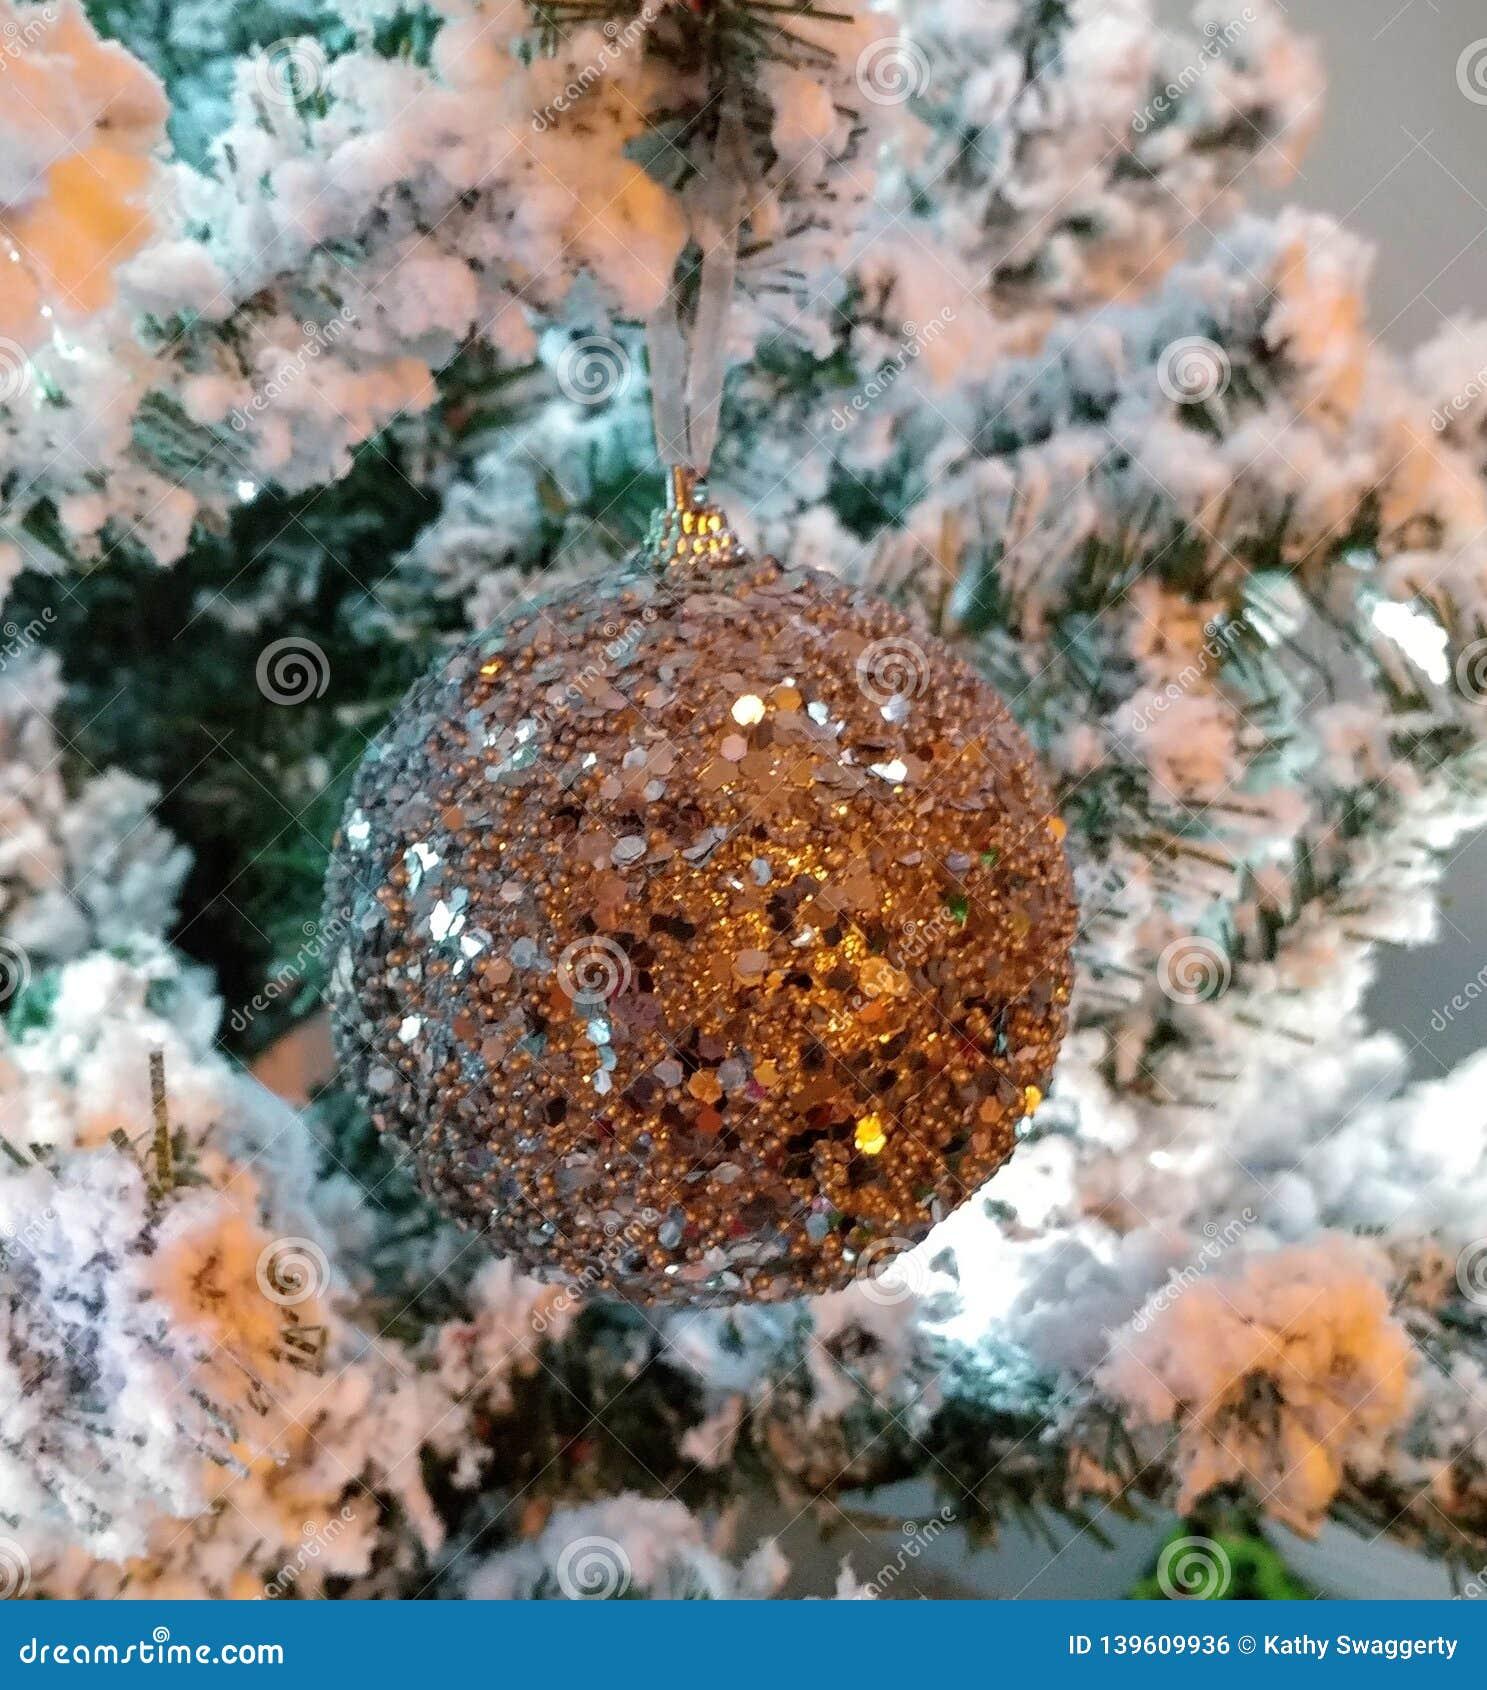 White Christmas Tree Ornaments Glam Glitter Stock Photo Image Of Tree Background 139609936